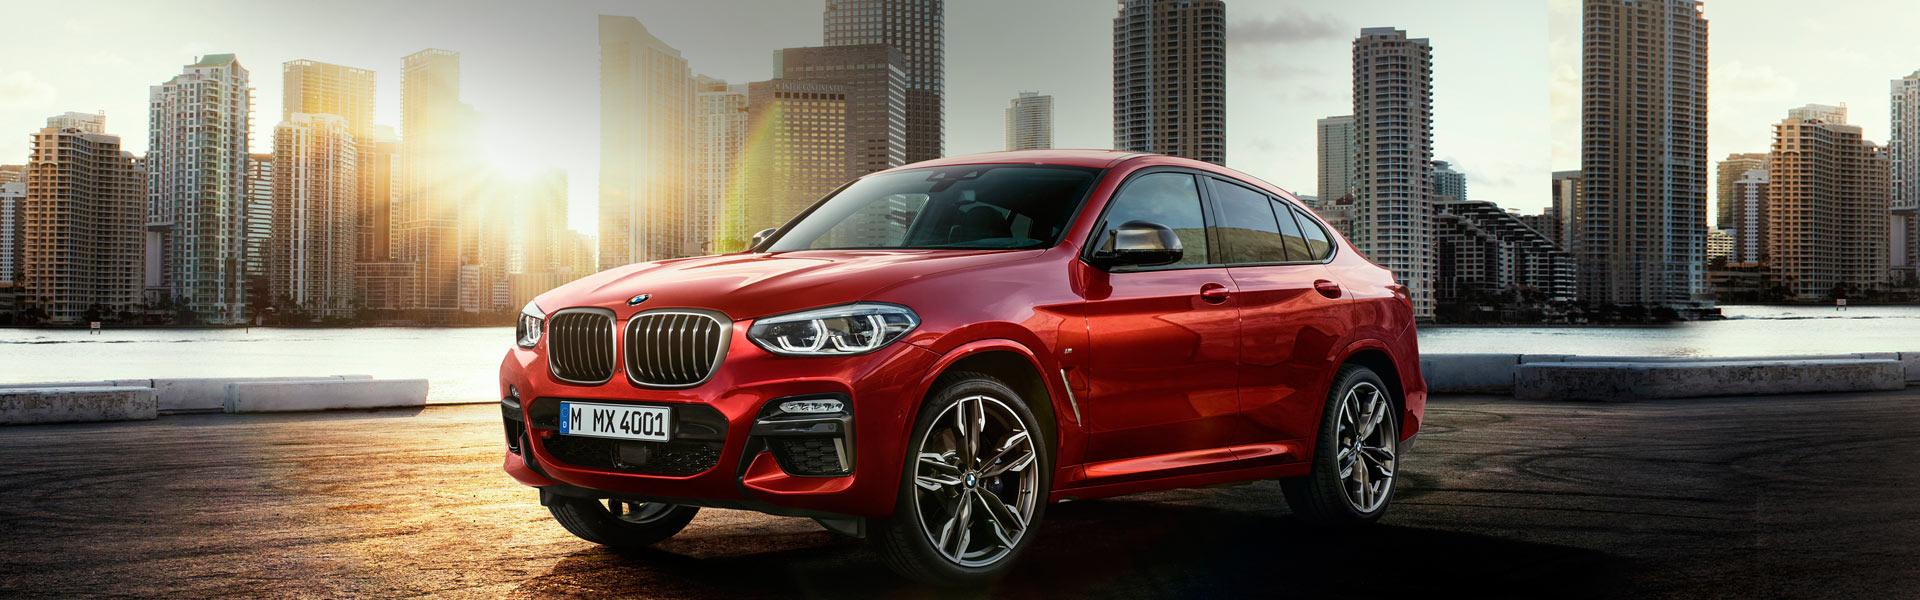 Сайлентблок на BMW X4